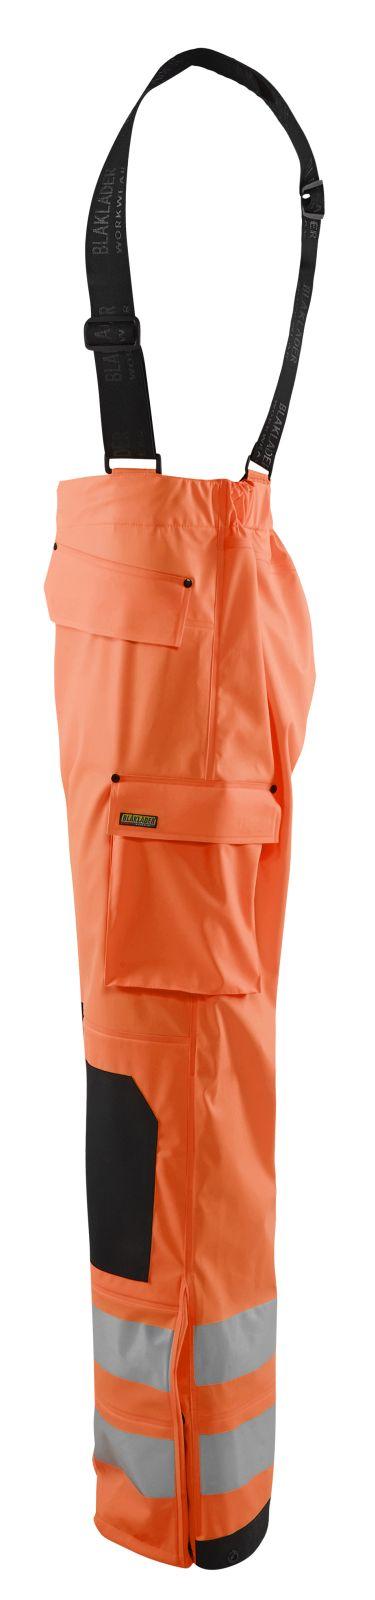 Blaklader Regenbroeken 13022003 High Vis oranje(5300)